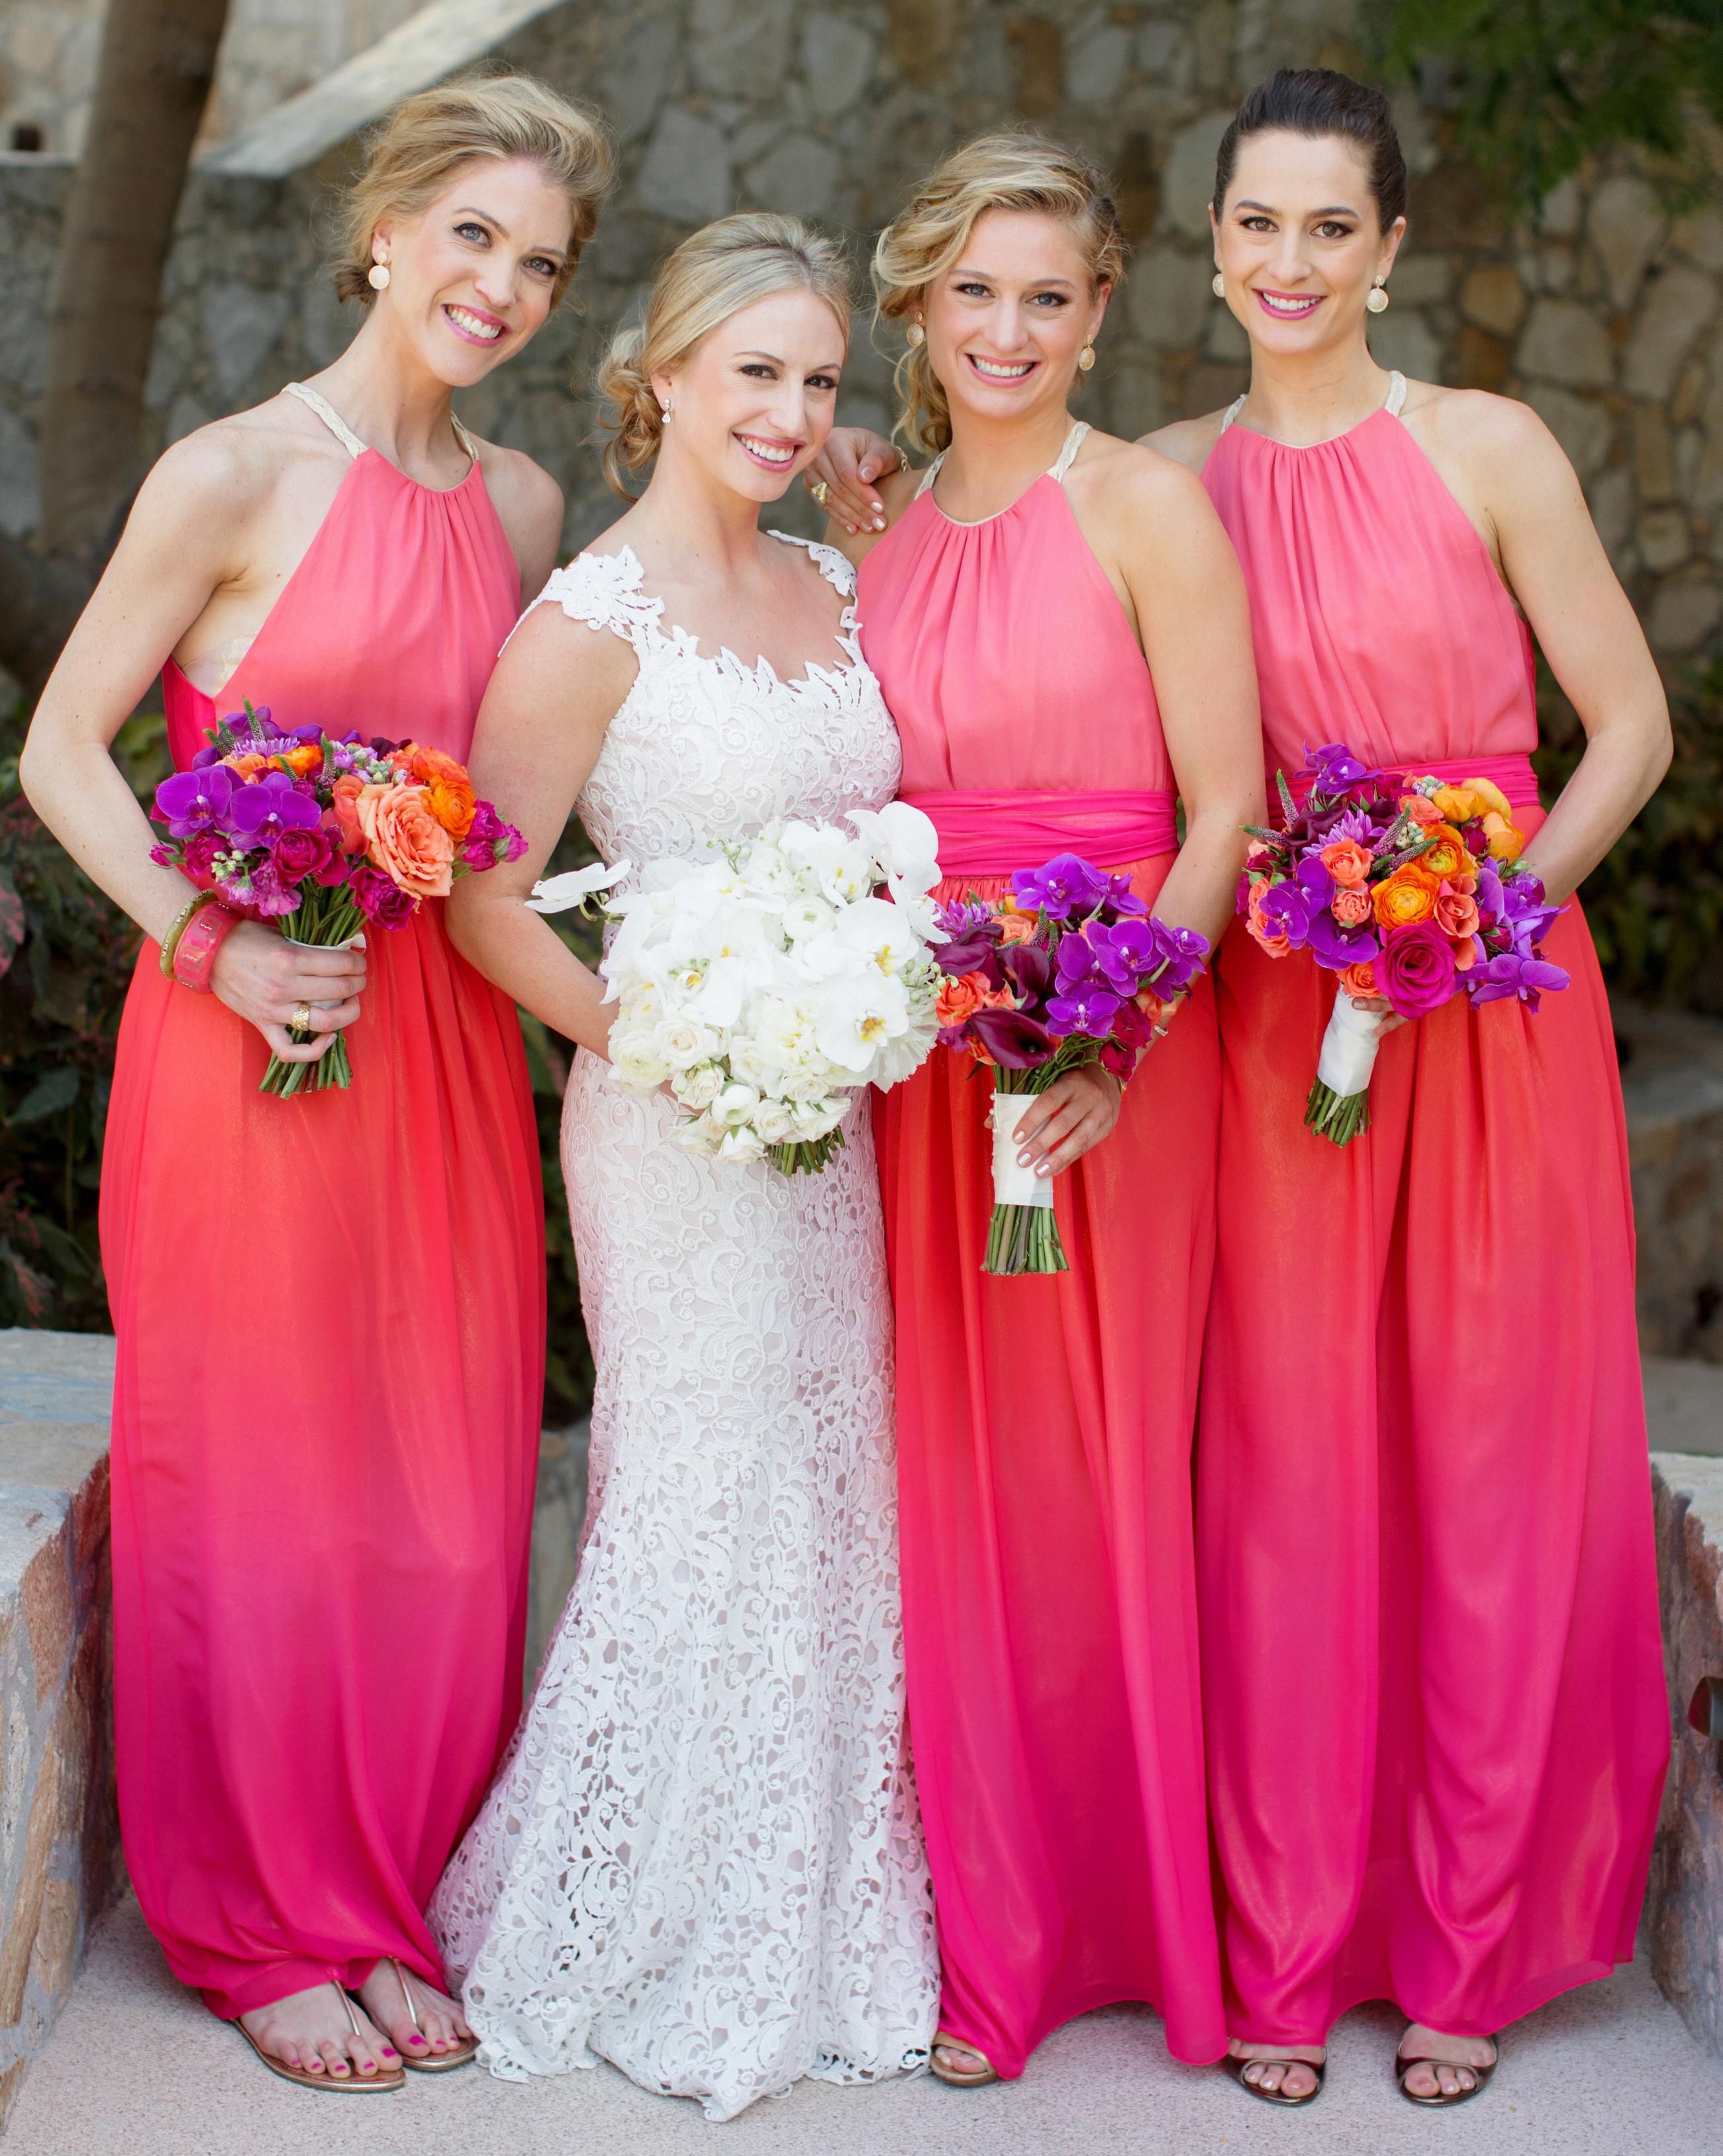 veronica-mathieu-wedding-bridesmaids-0929-s111501-1014.jpg